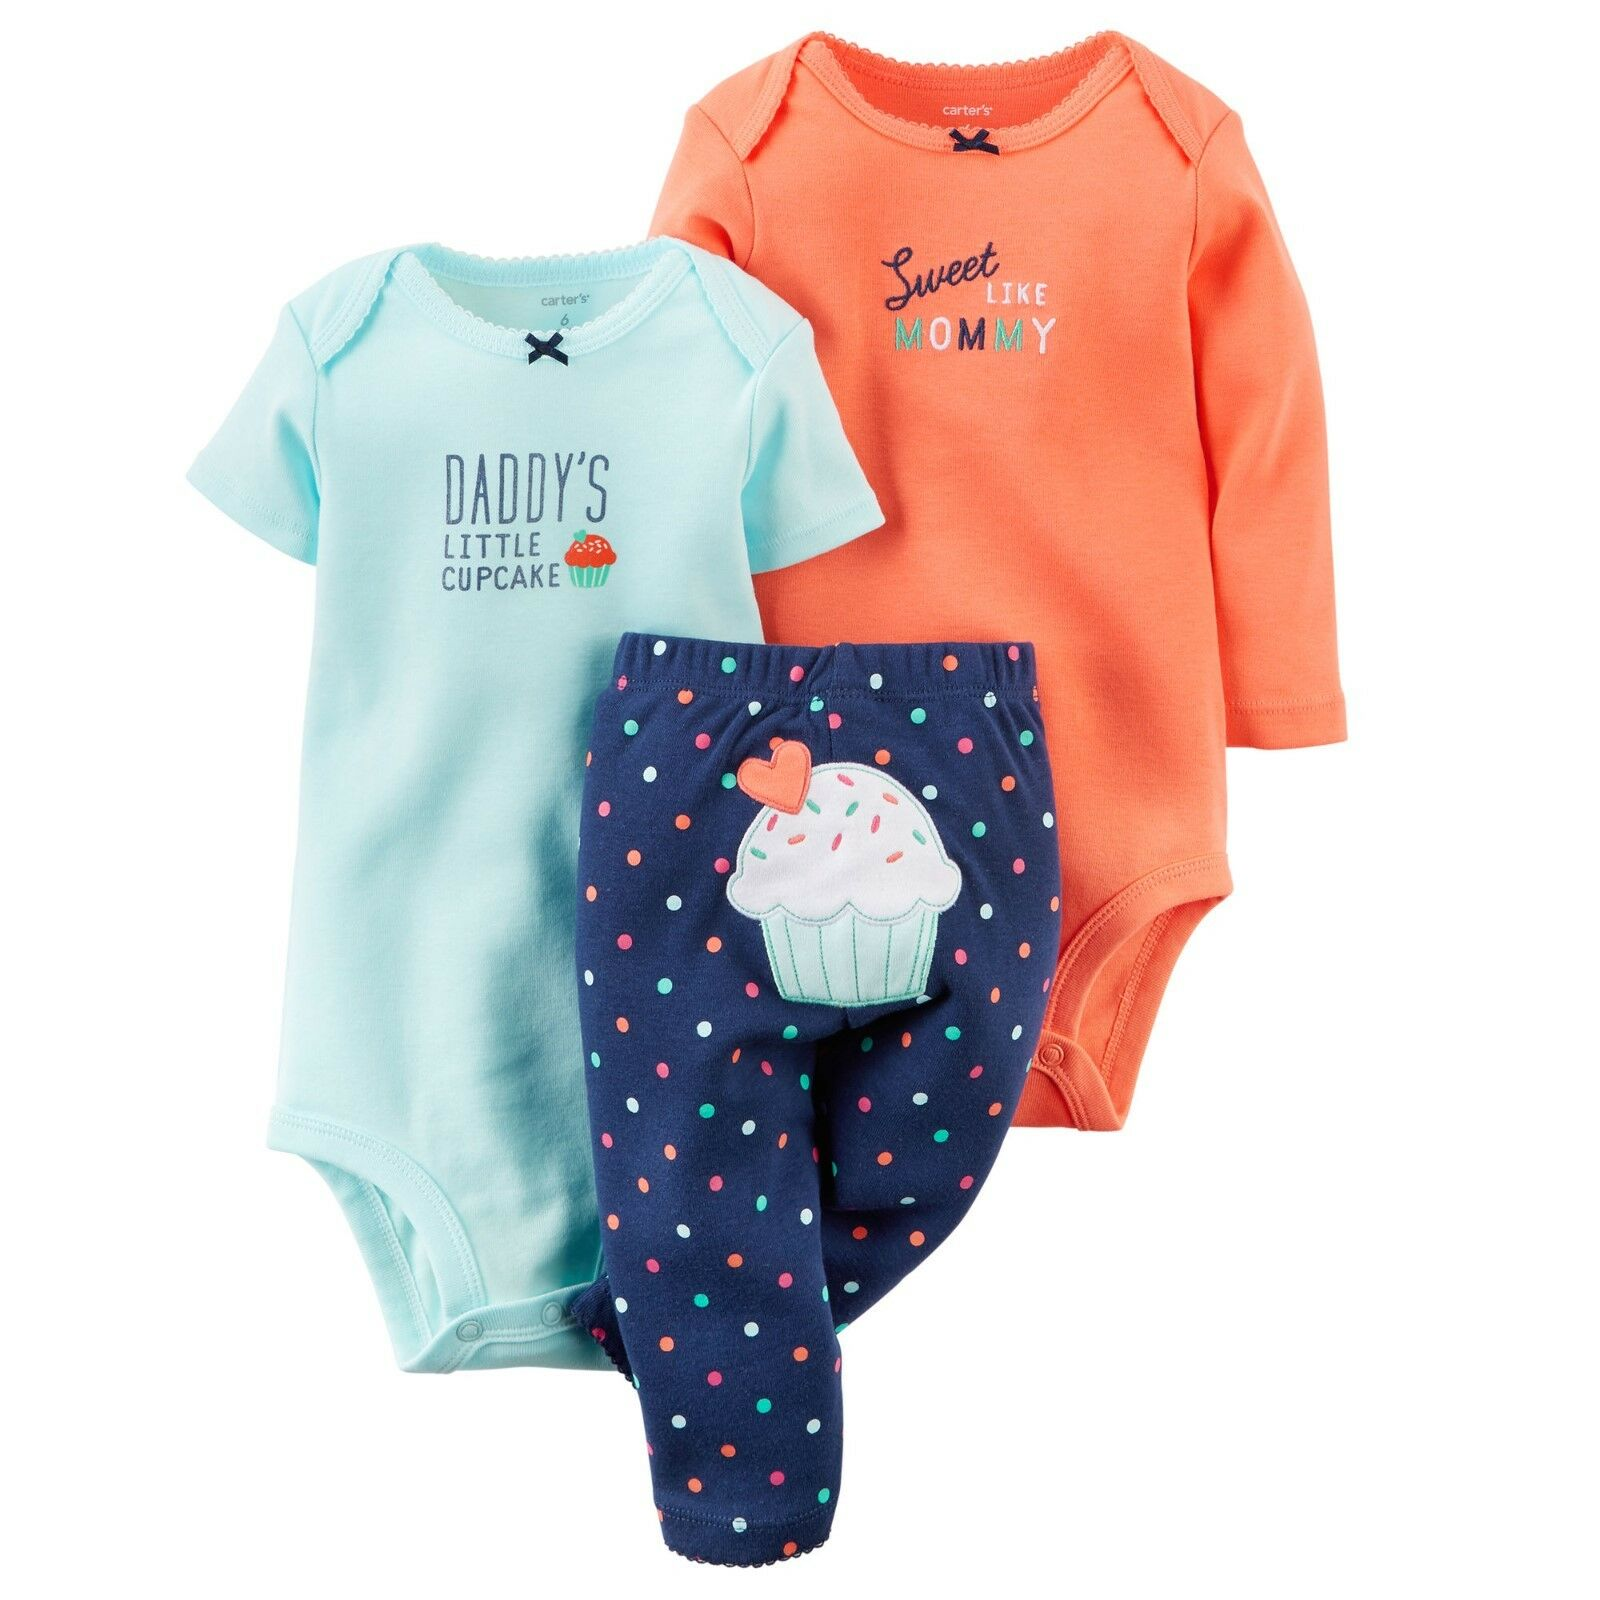 Girls Clothing Newborn 5T Baby & Toddler Clothing Clothing